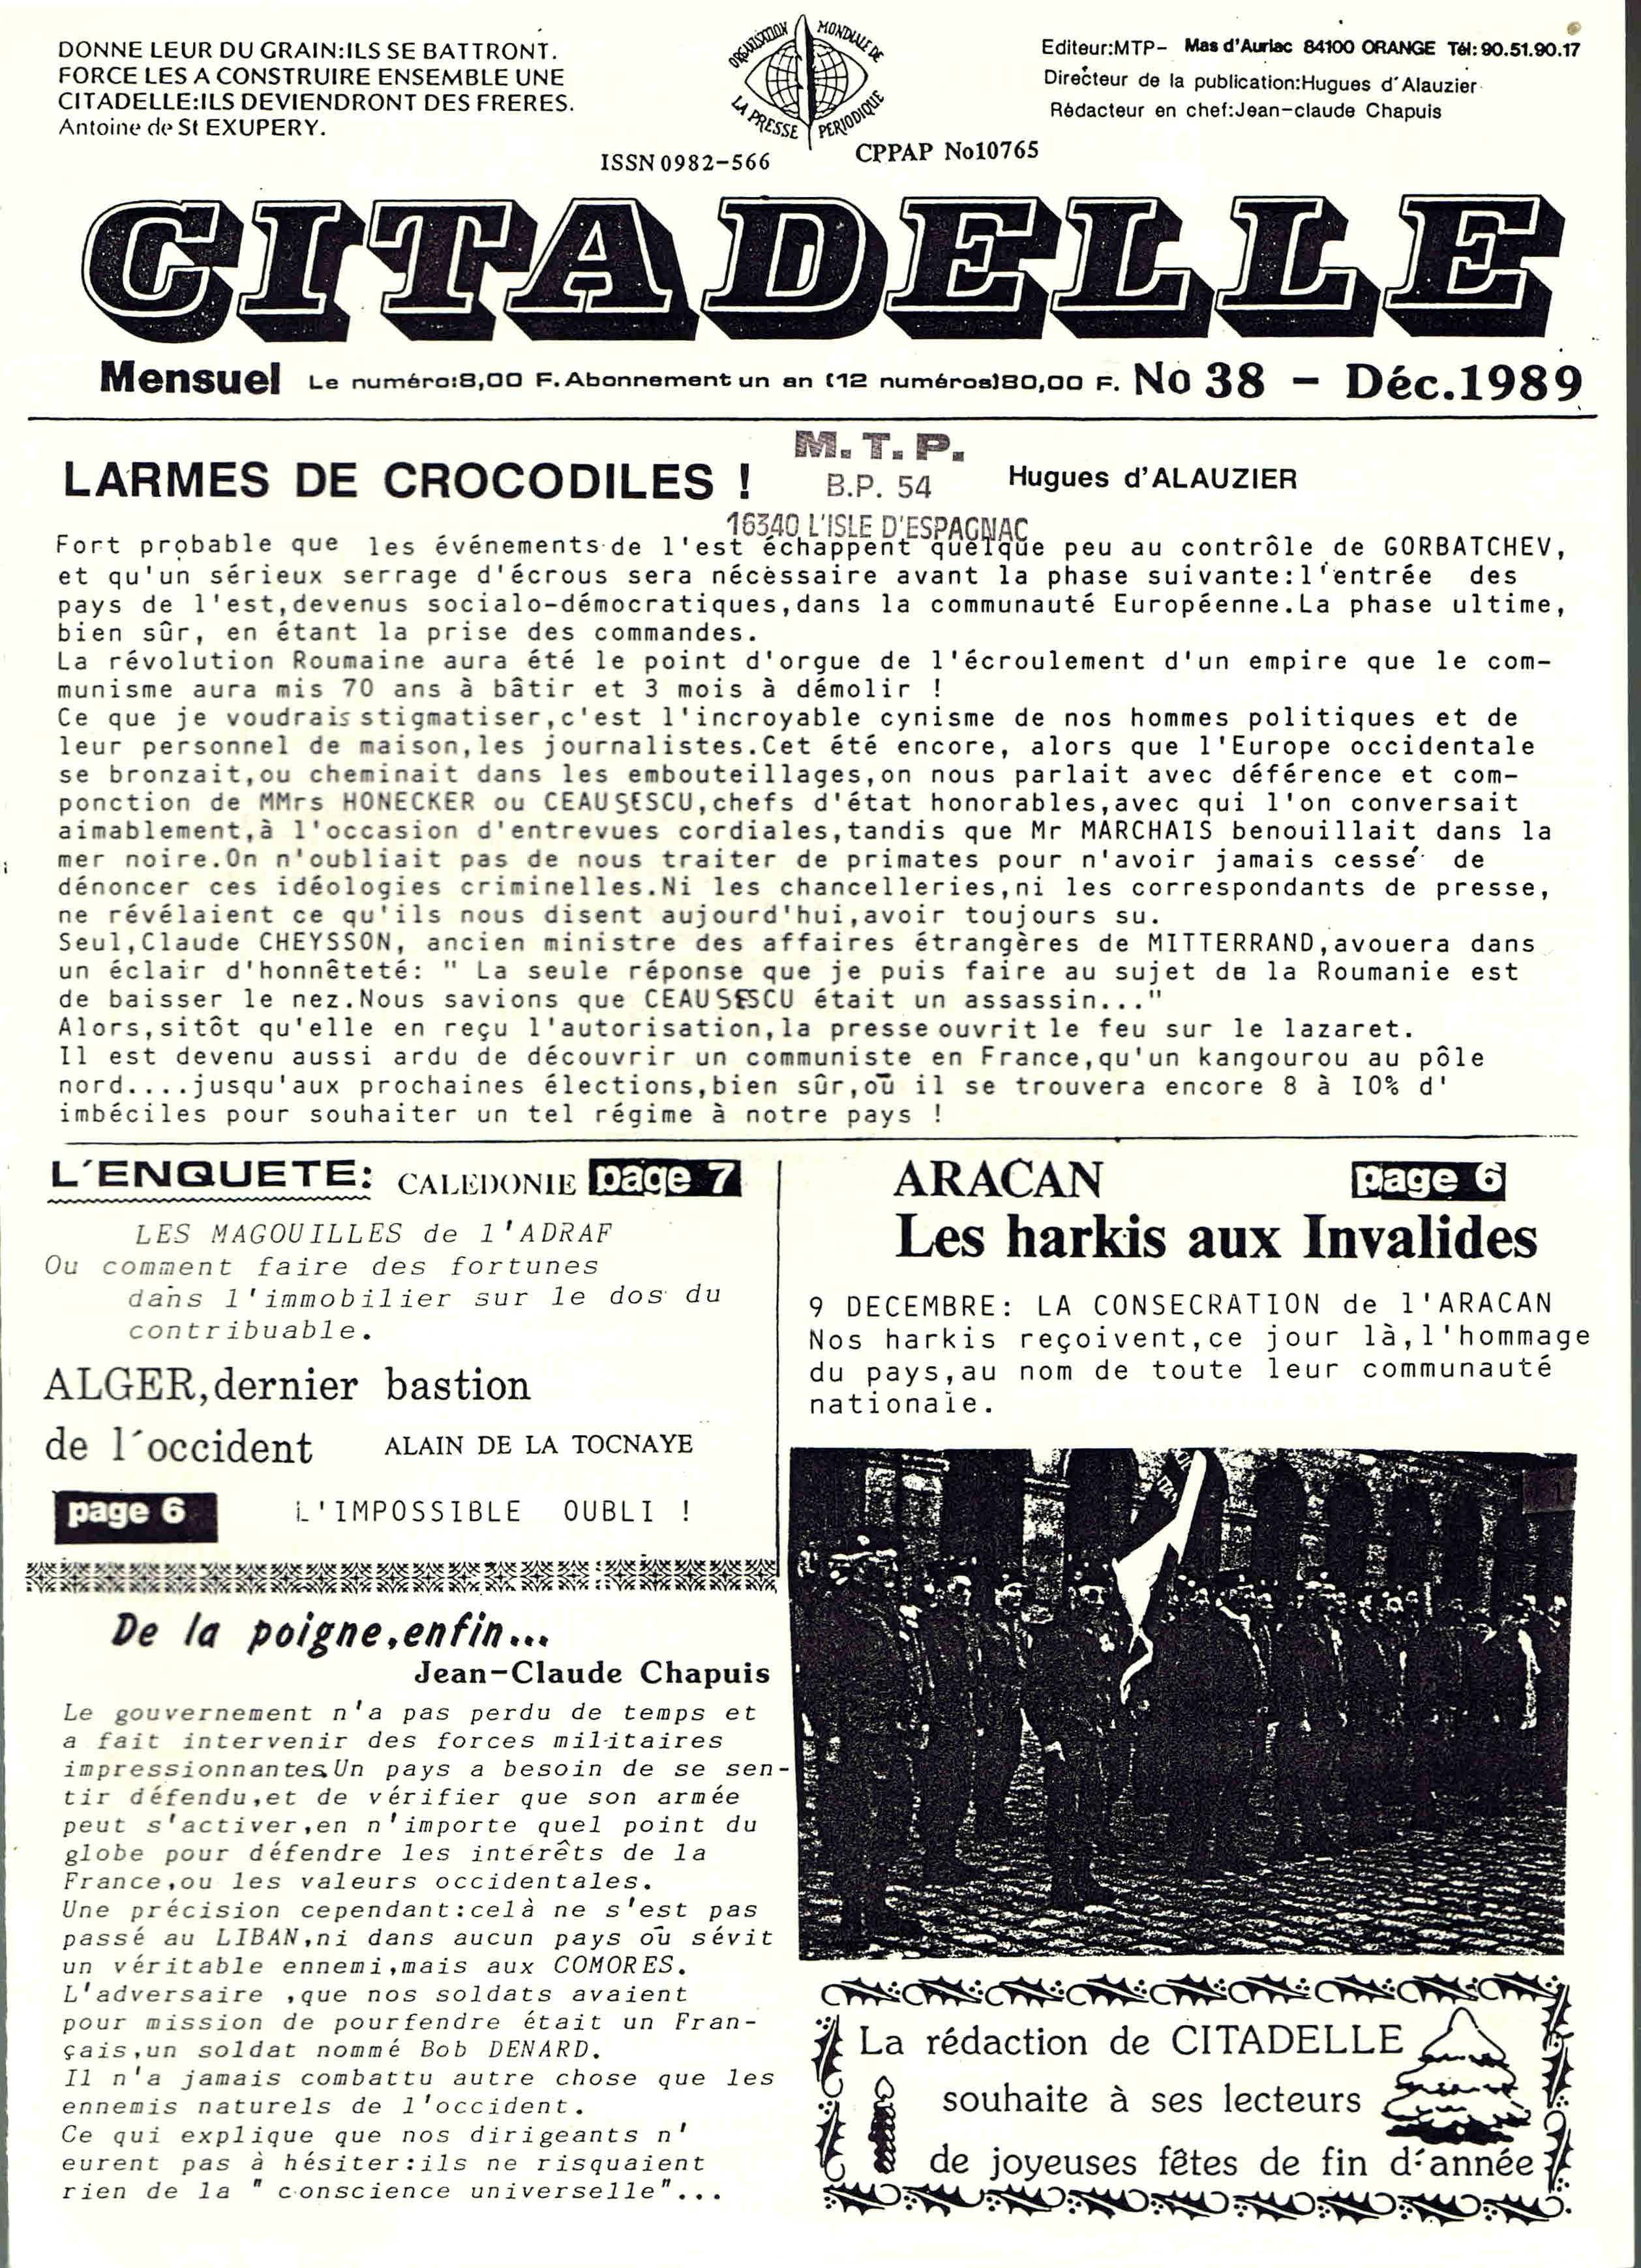 Document (149)sde (2)